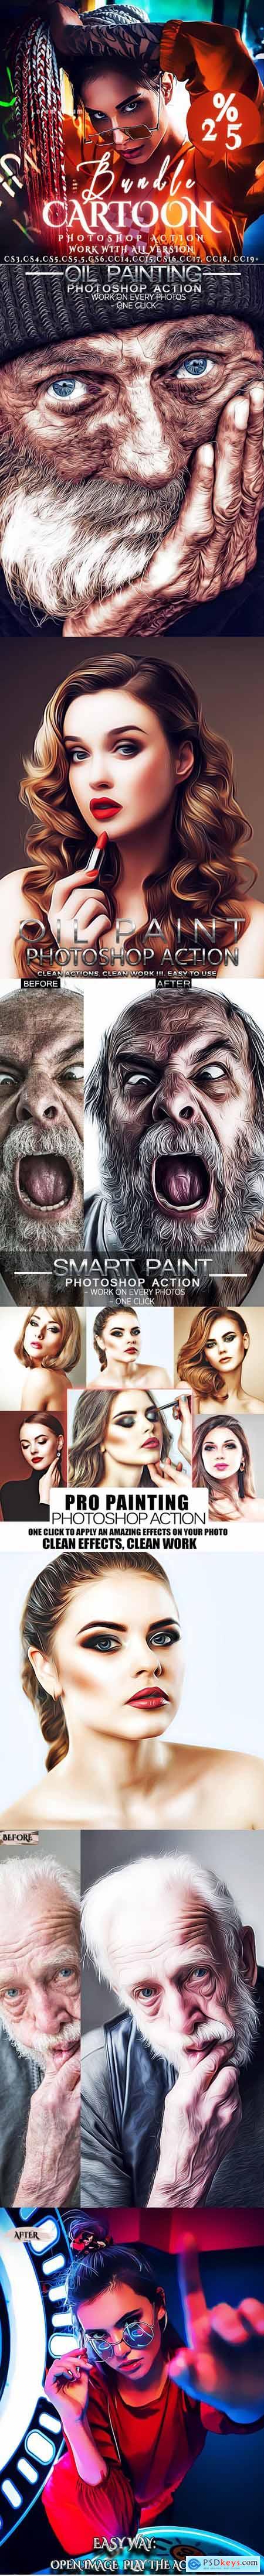 Bundle Cartoon Painting Photoshop Actions 26075116